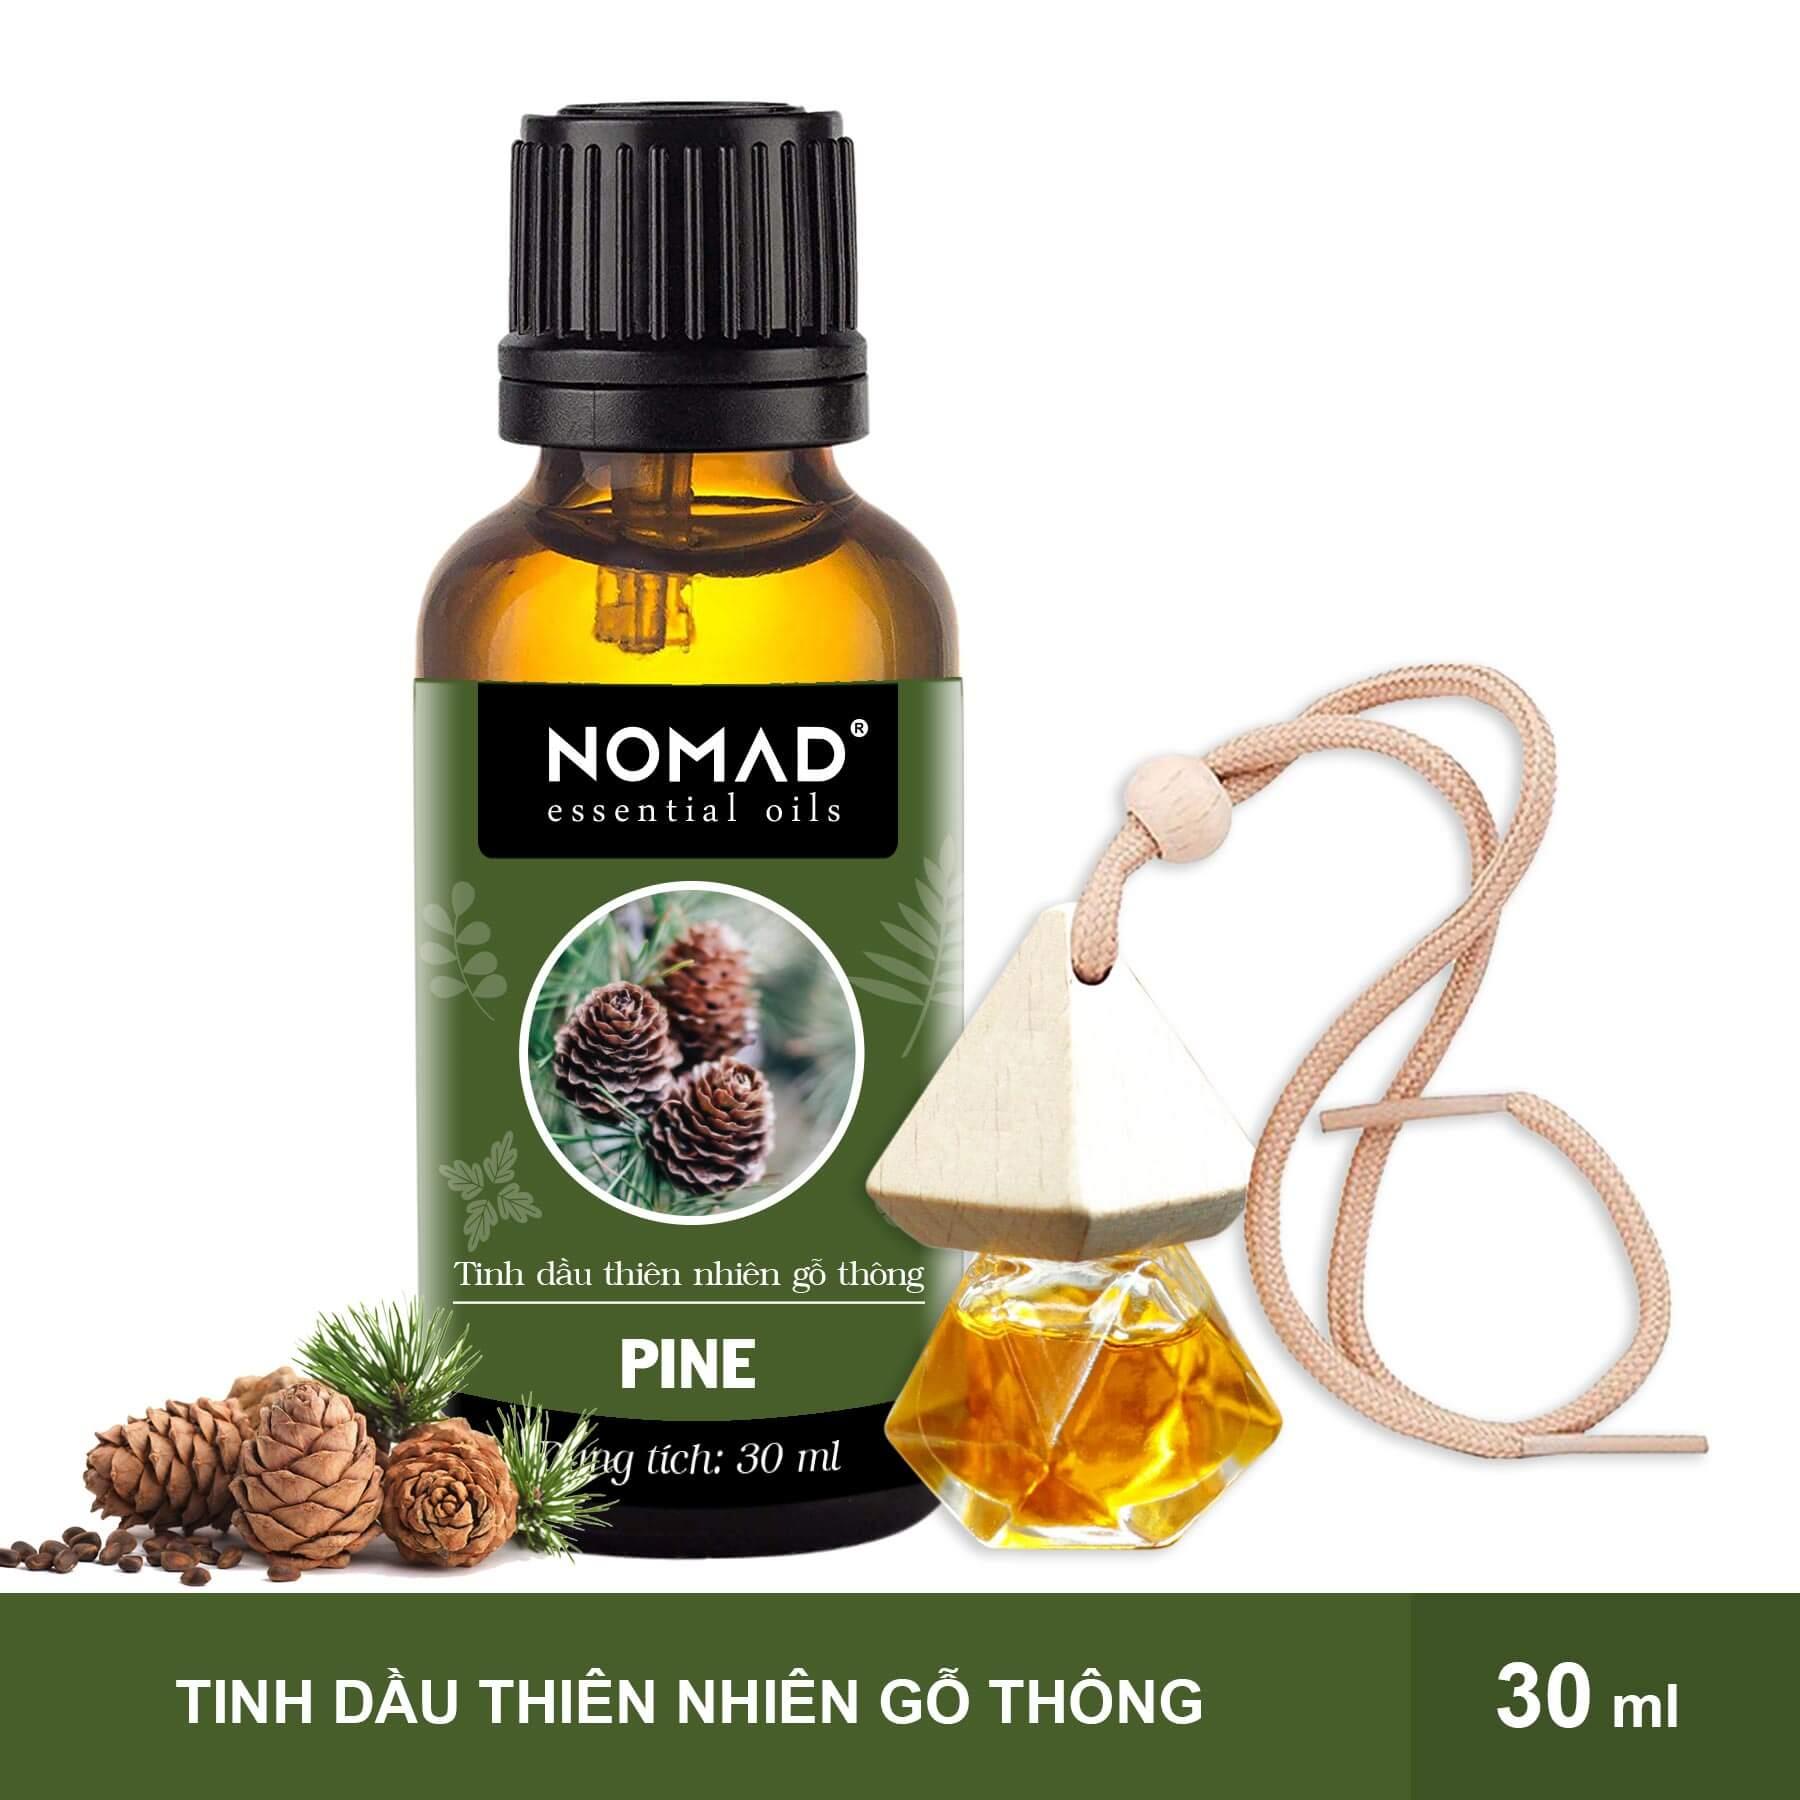 combo-tinh-dau-go-thong-nomad-essential-oils-pine-30ml-va-vo-tinh-dau-dang-treo